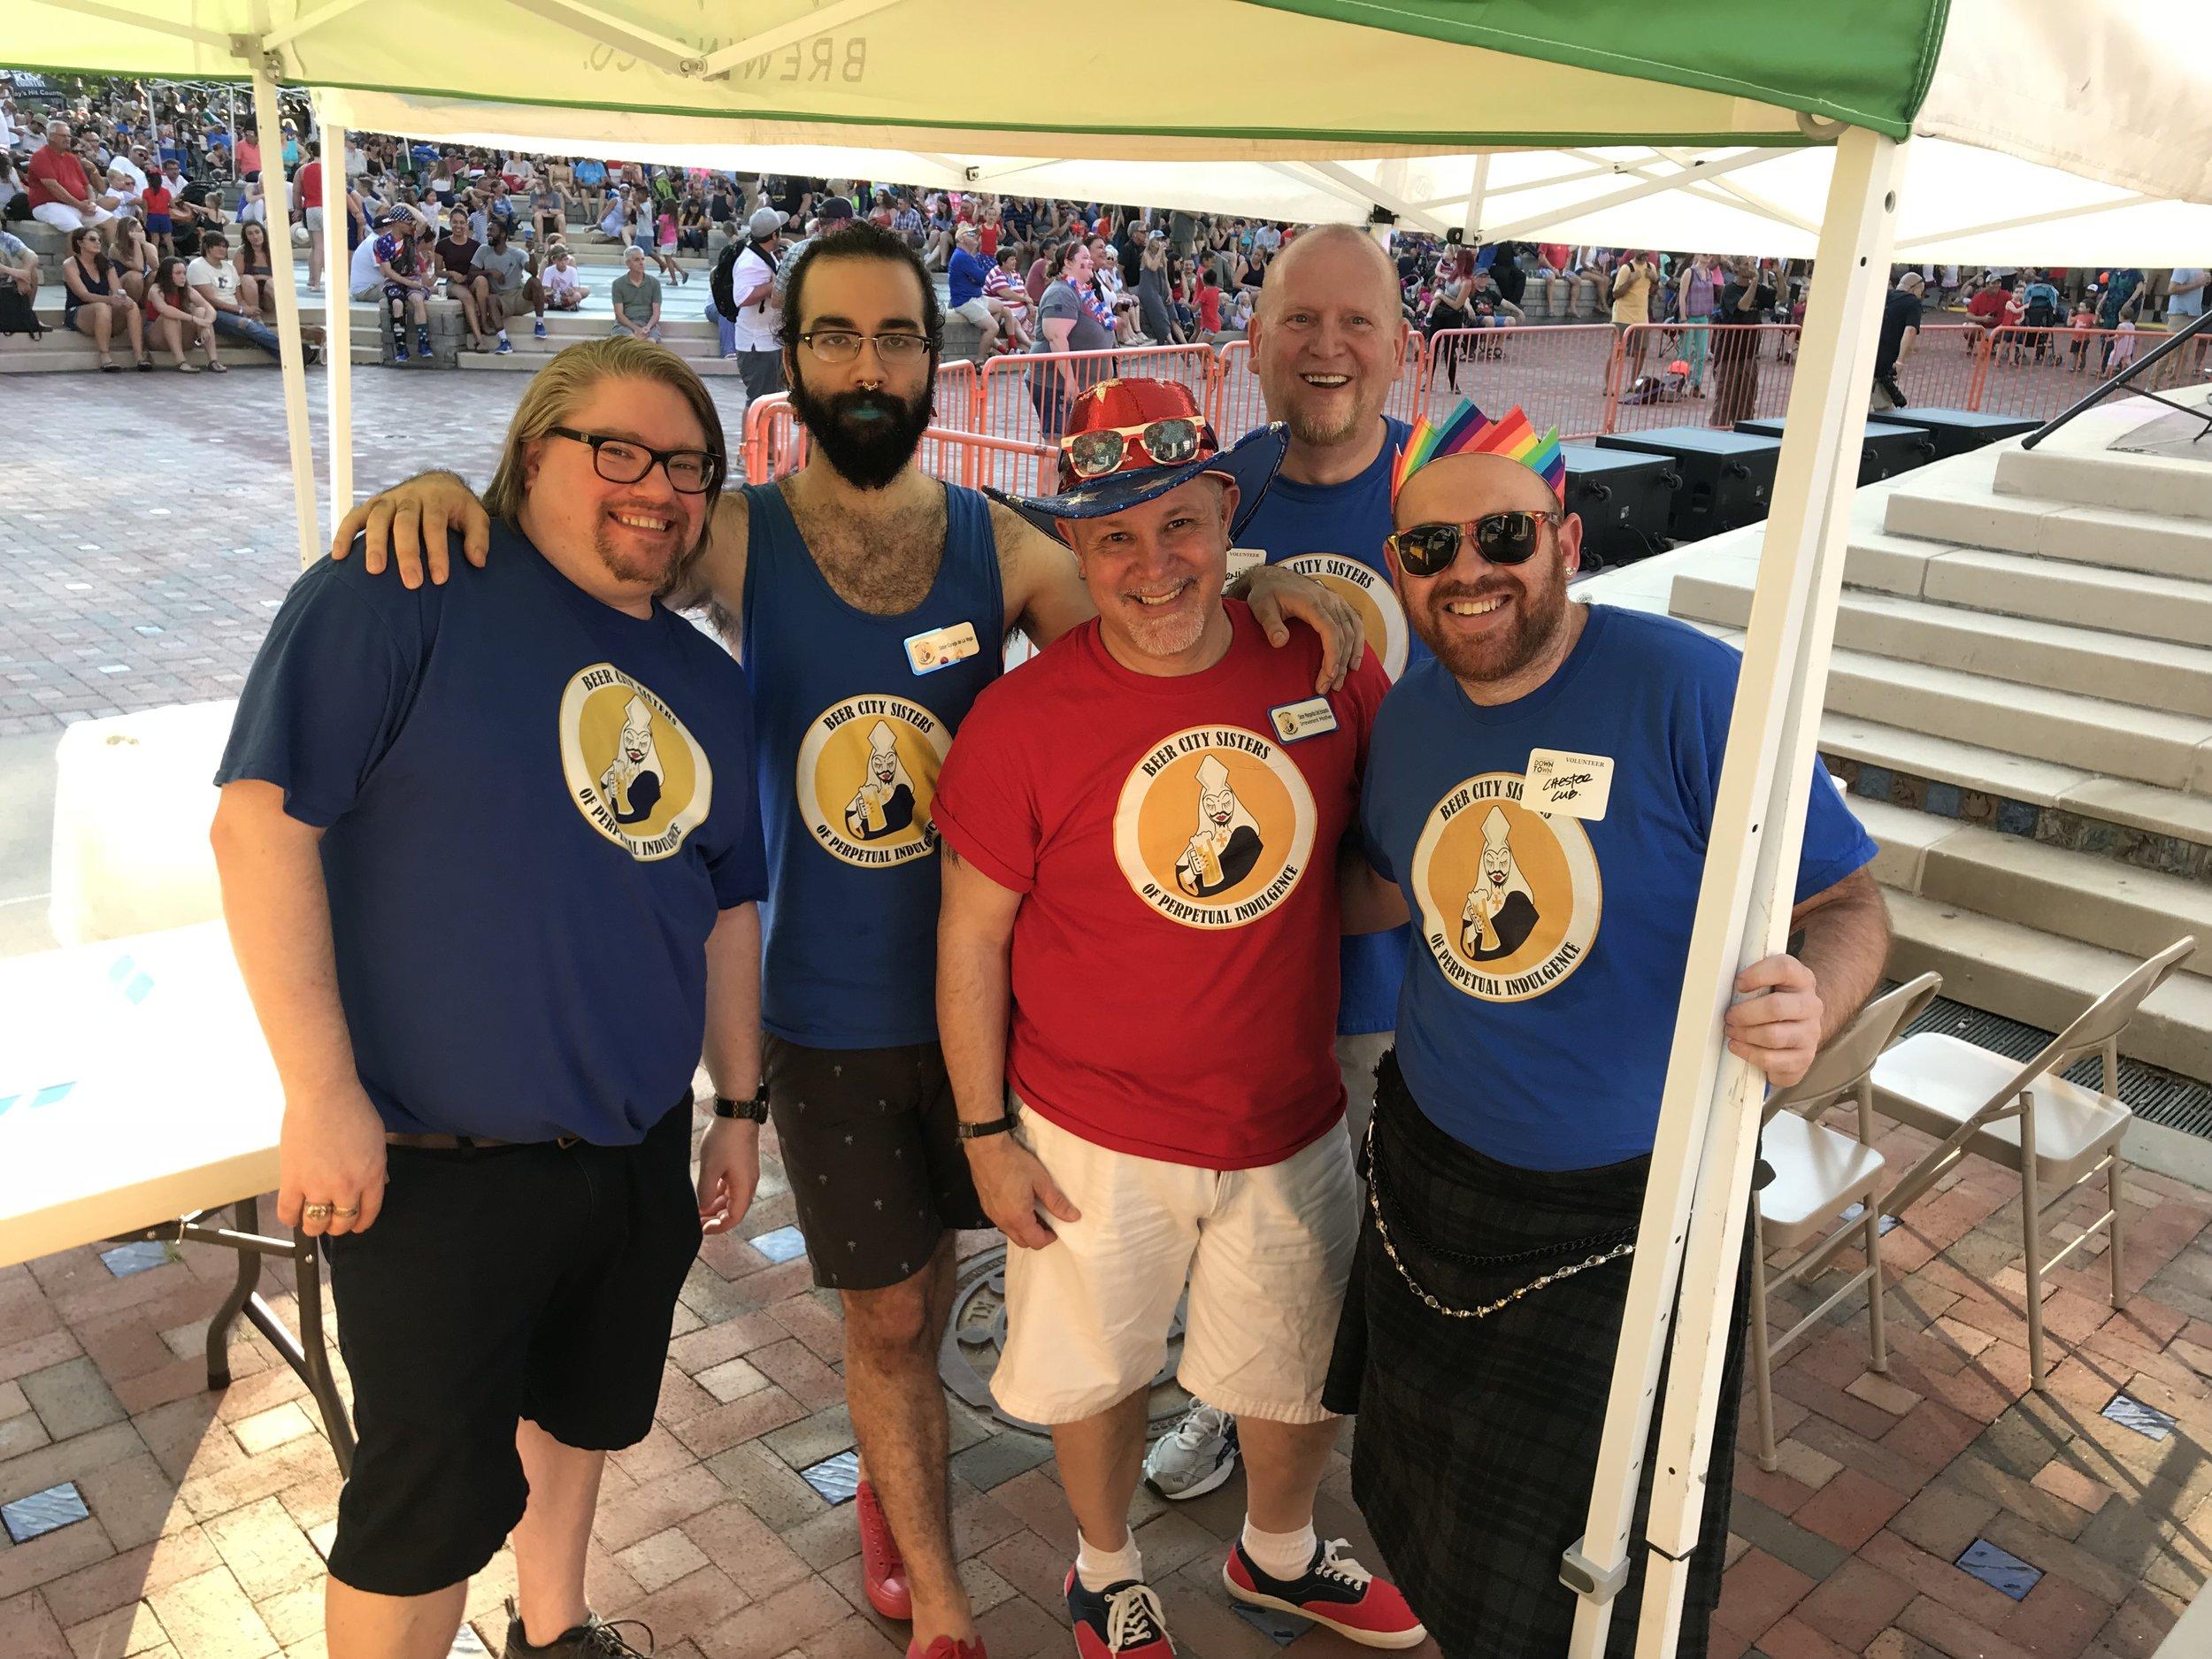 July 4, 2018 - Liberty Celebration